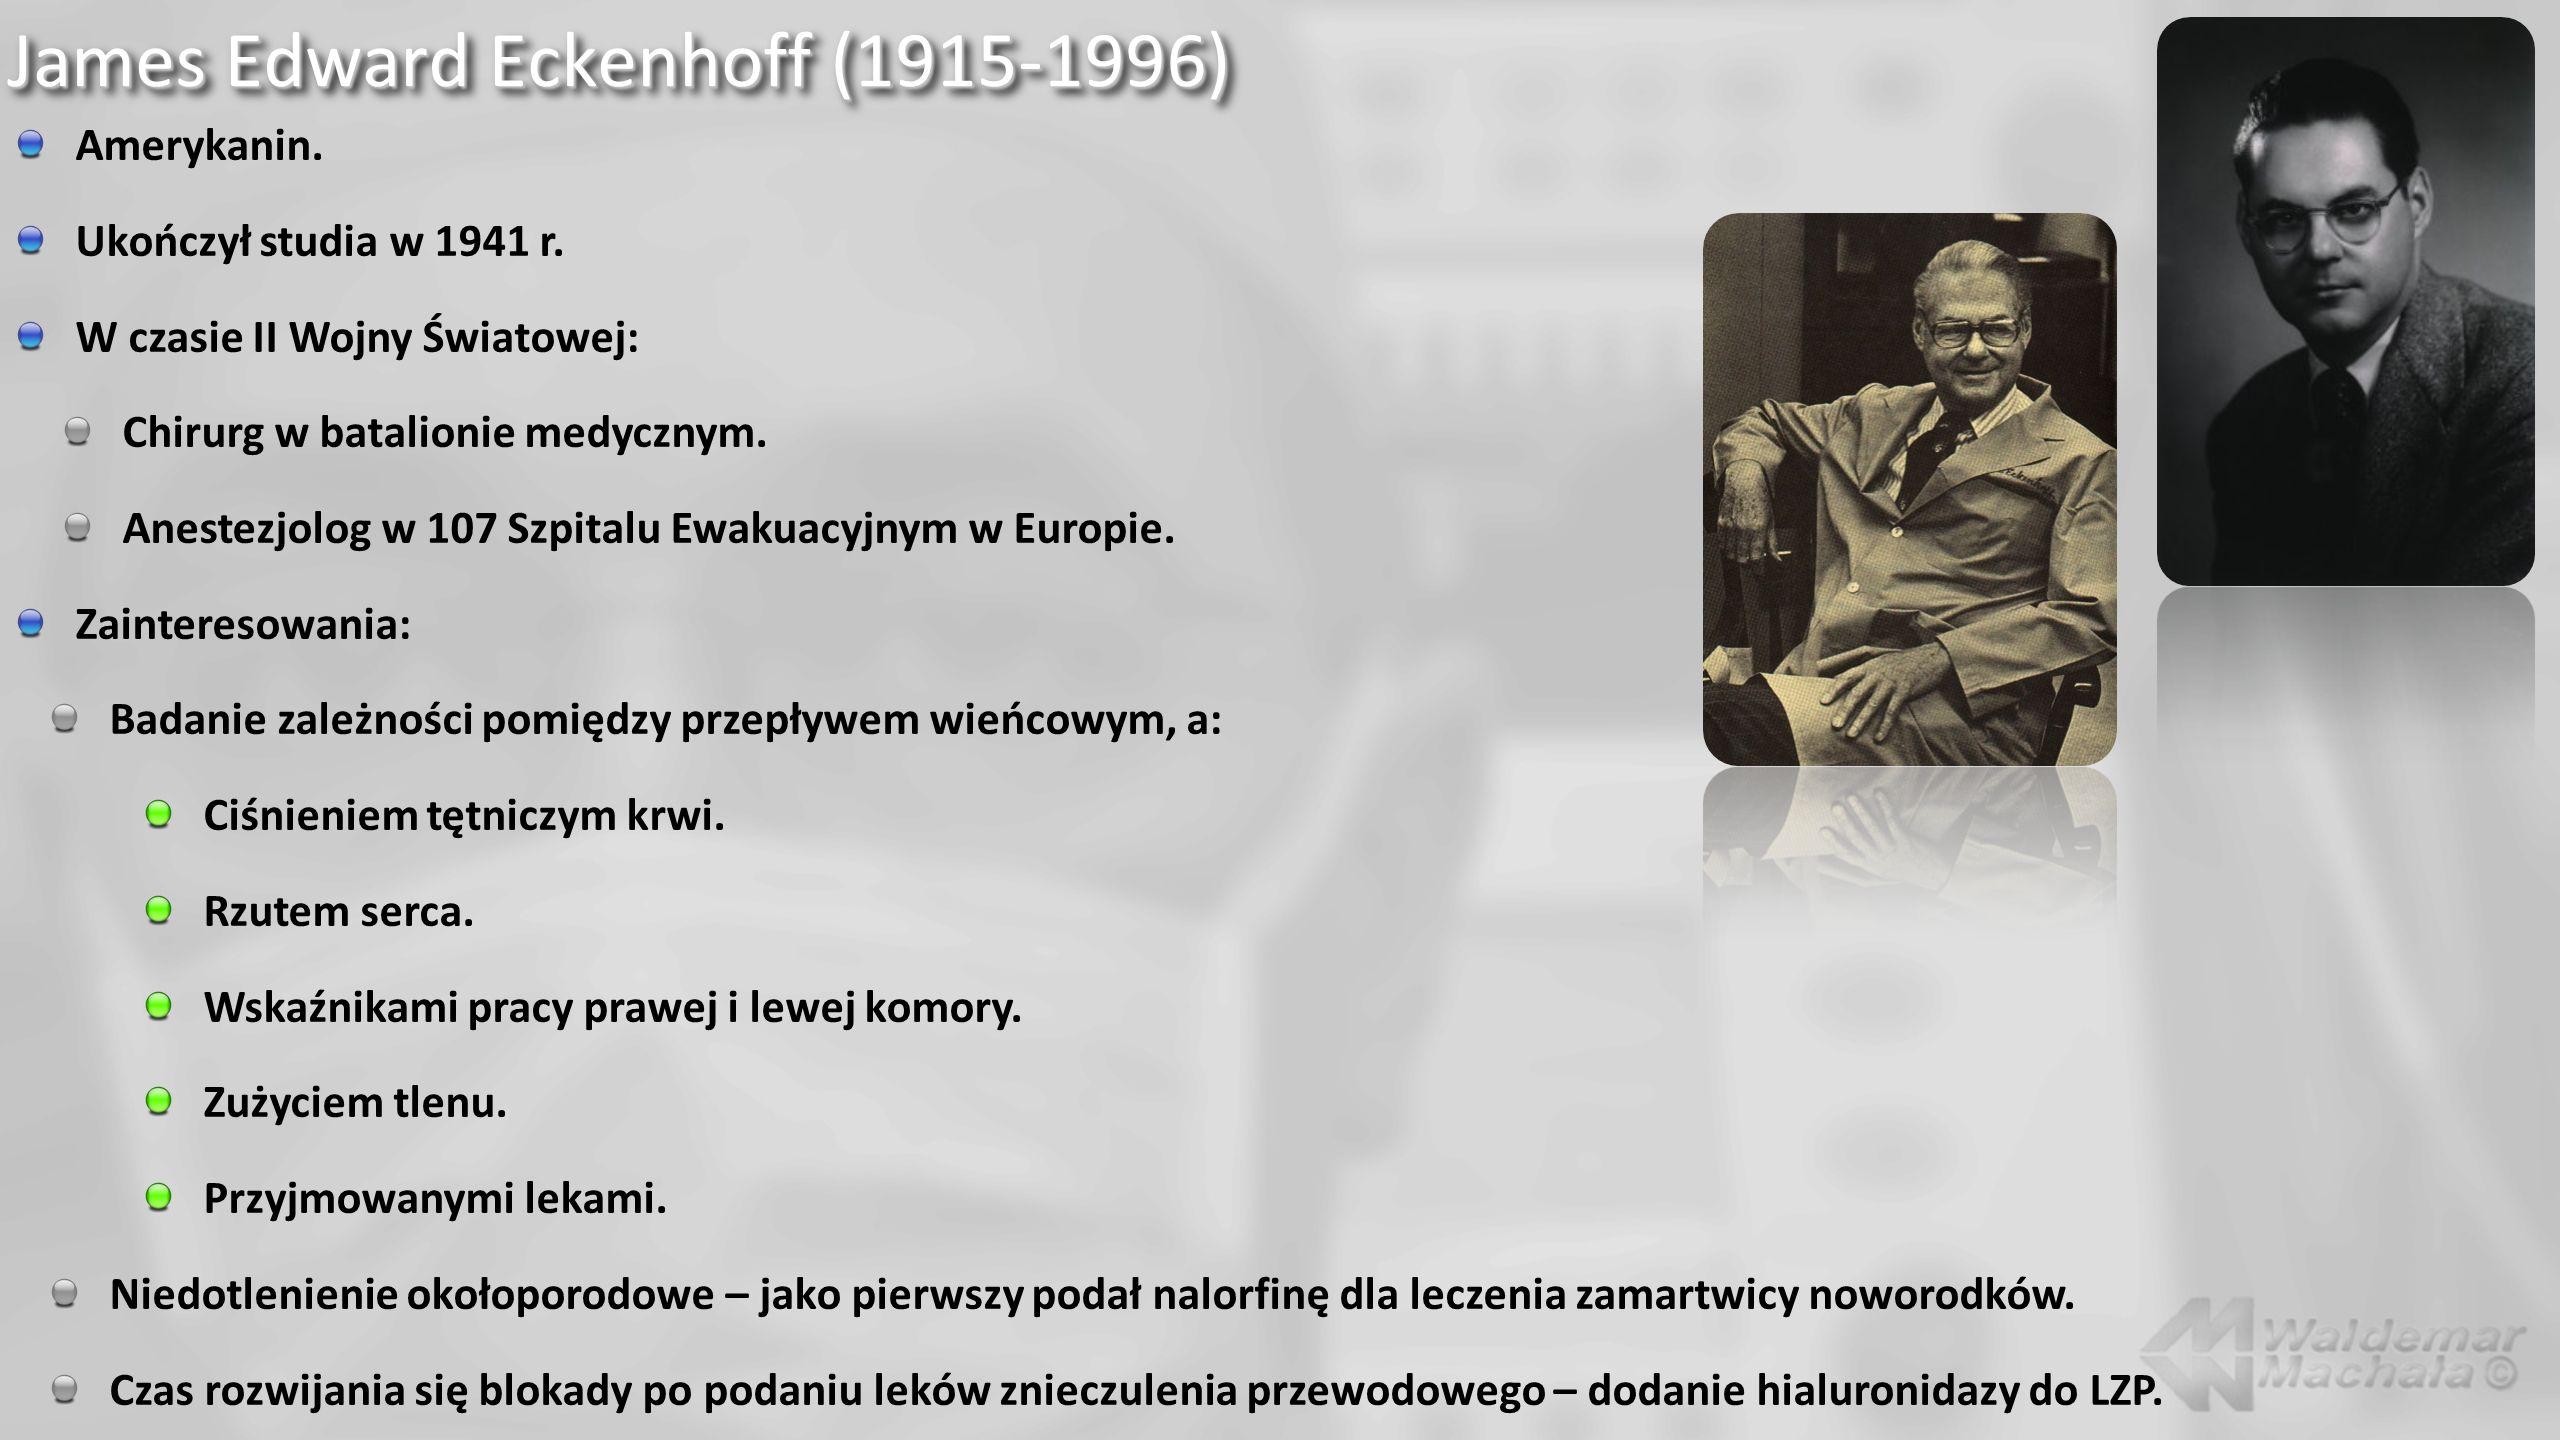 James Edward Eckenhoff (1915-1996)